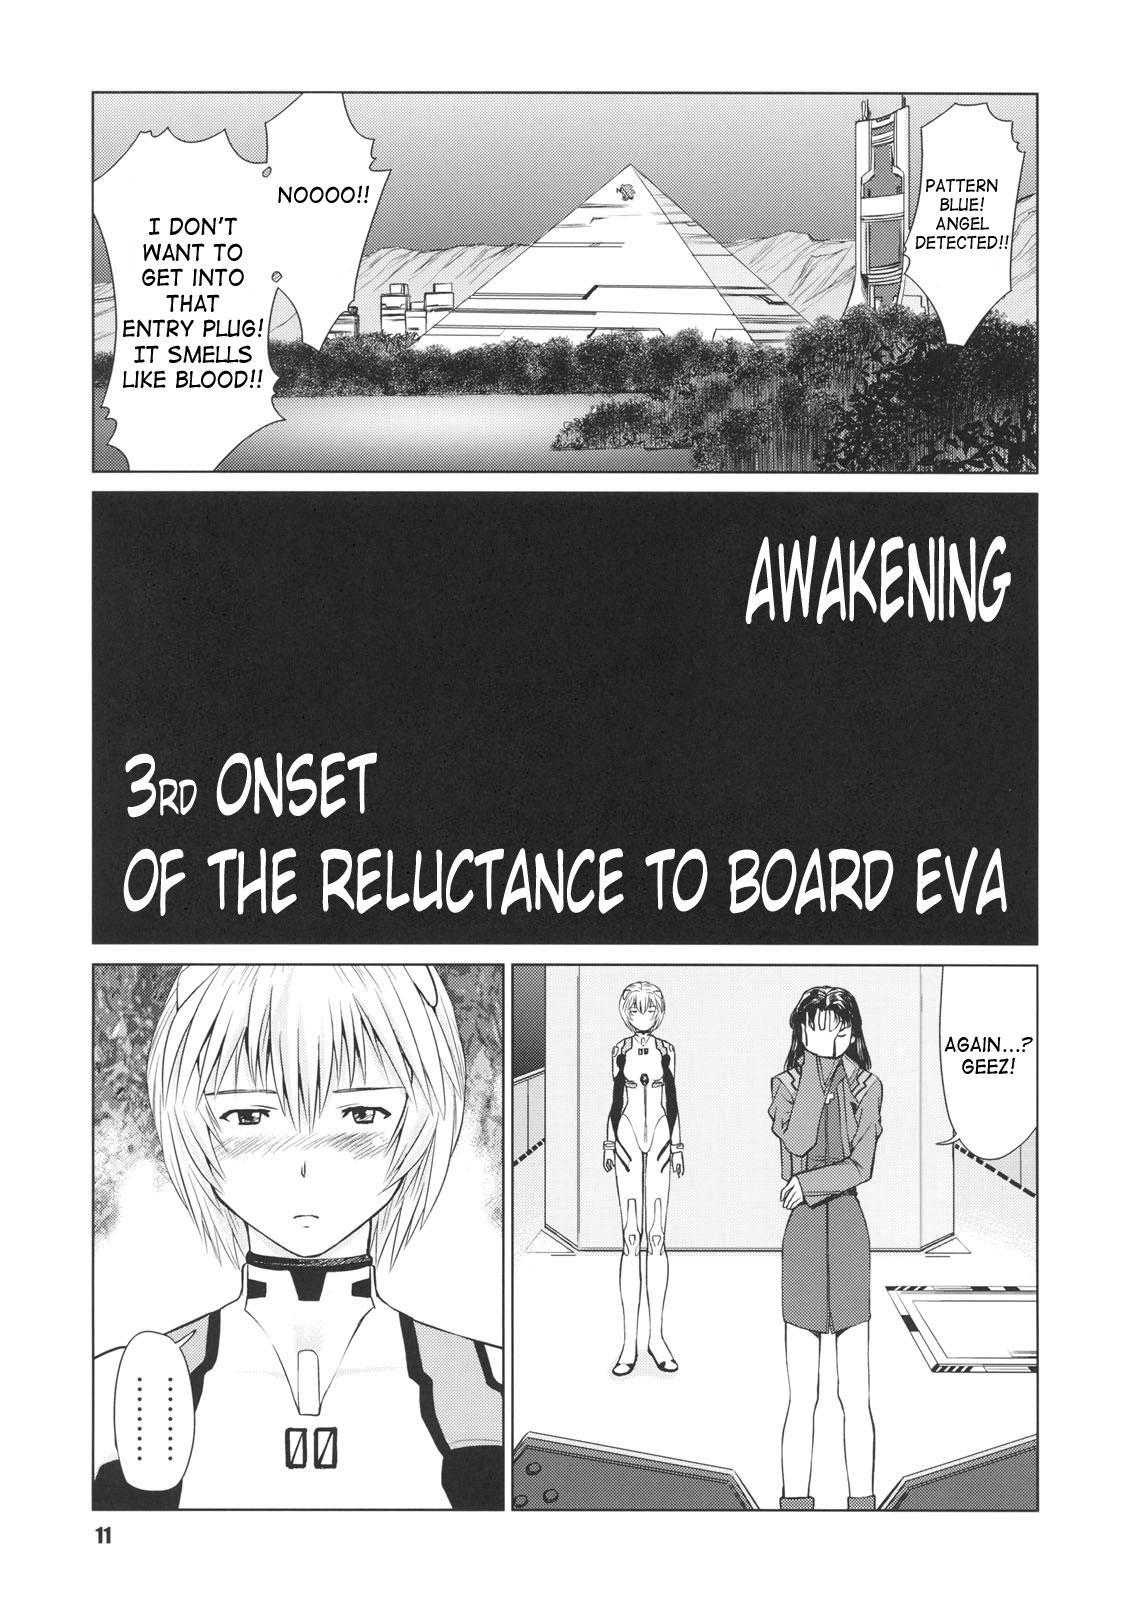 Ayanami no Okage | Thanks to Ayanami... 9